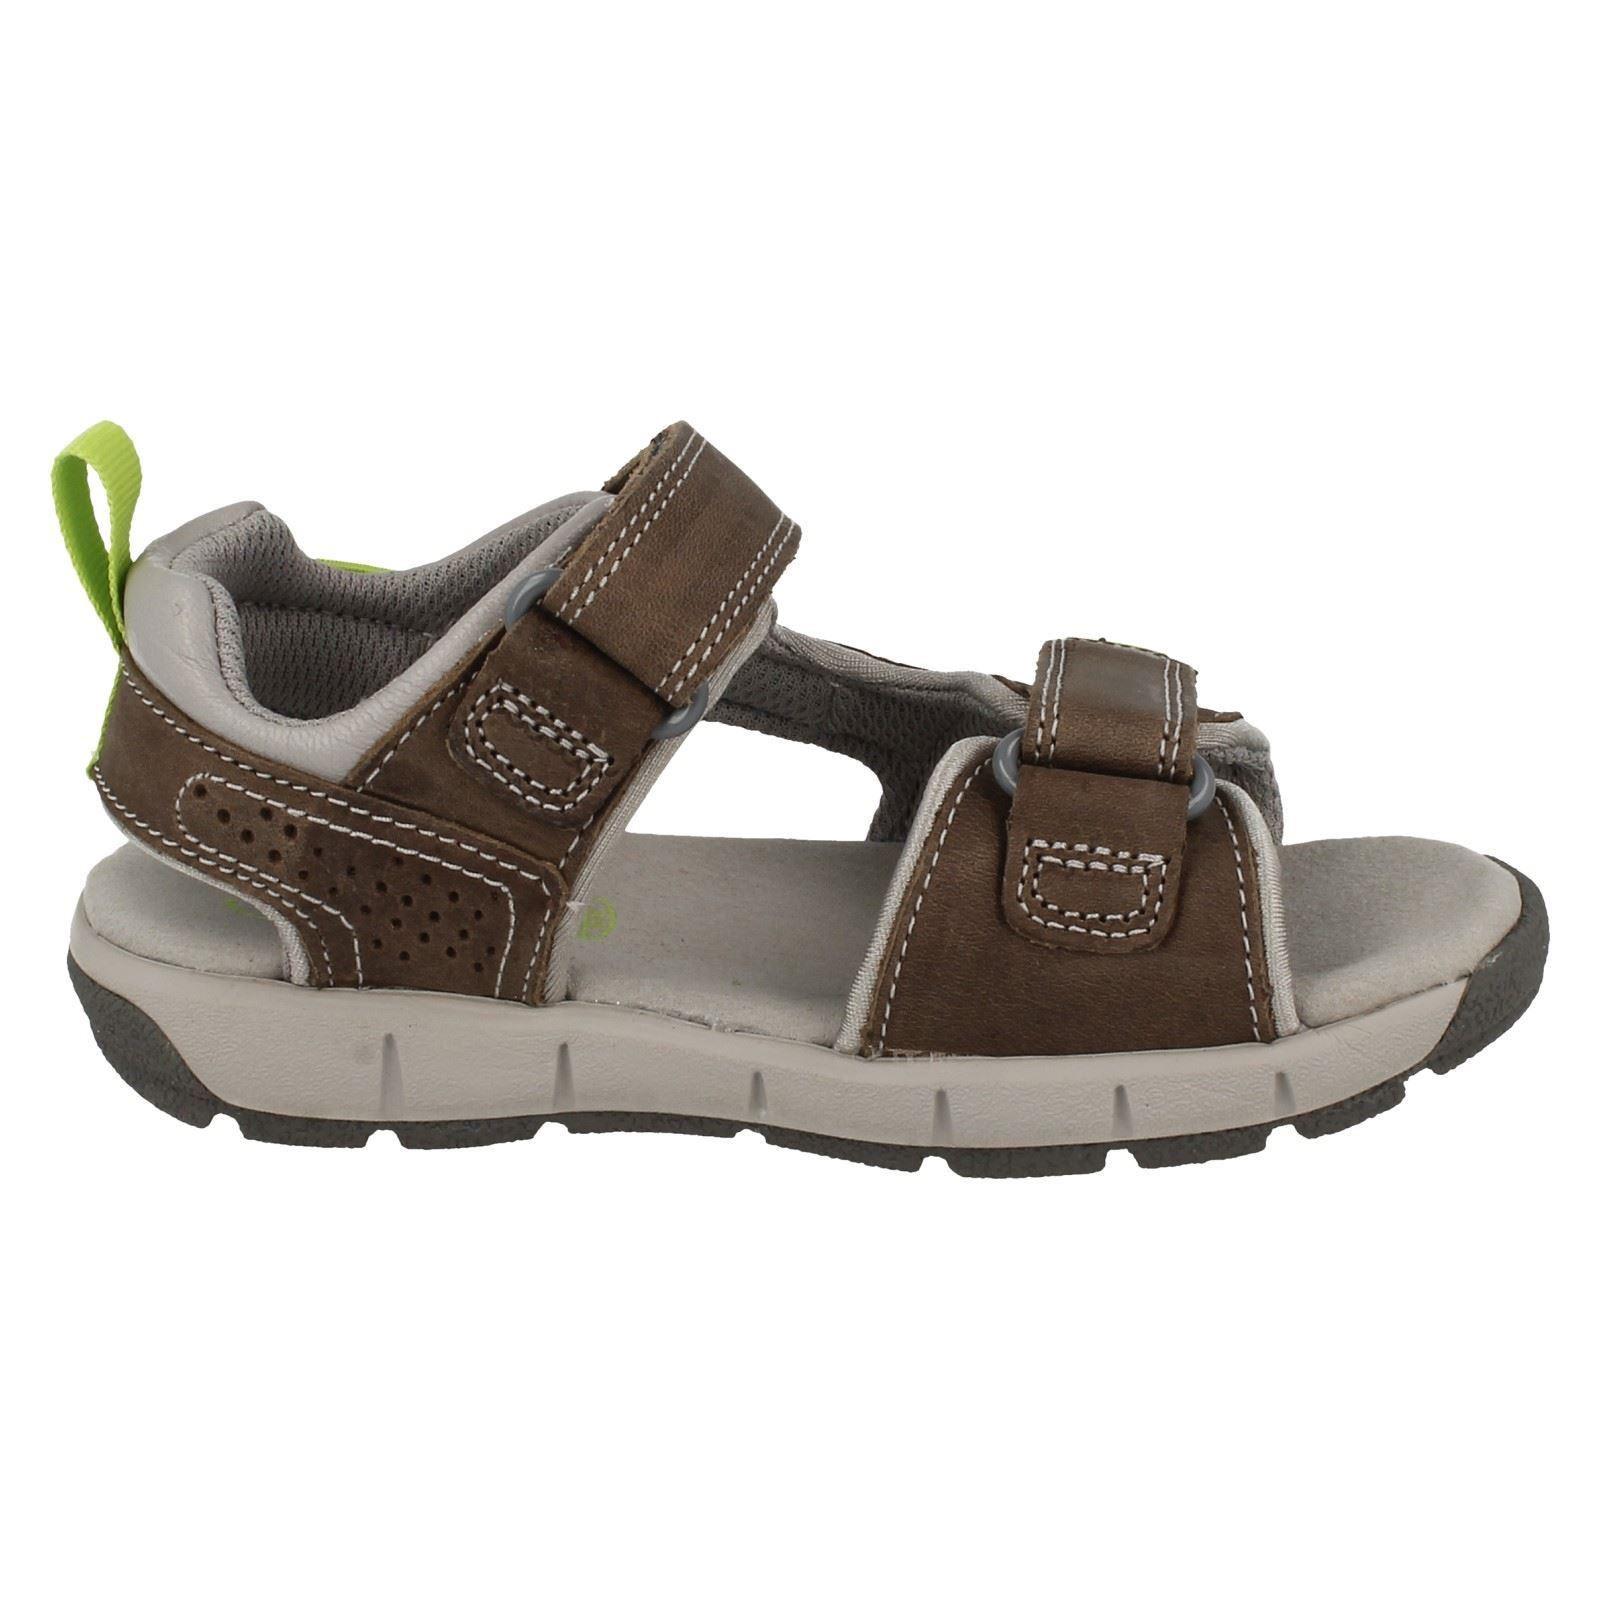 Details about InfantJunior Boys Clarks Jolly Wild Casual Summer Sandals